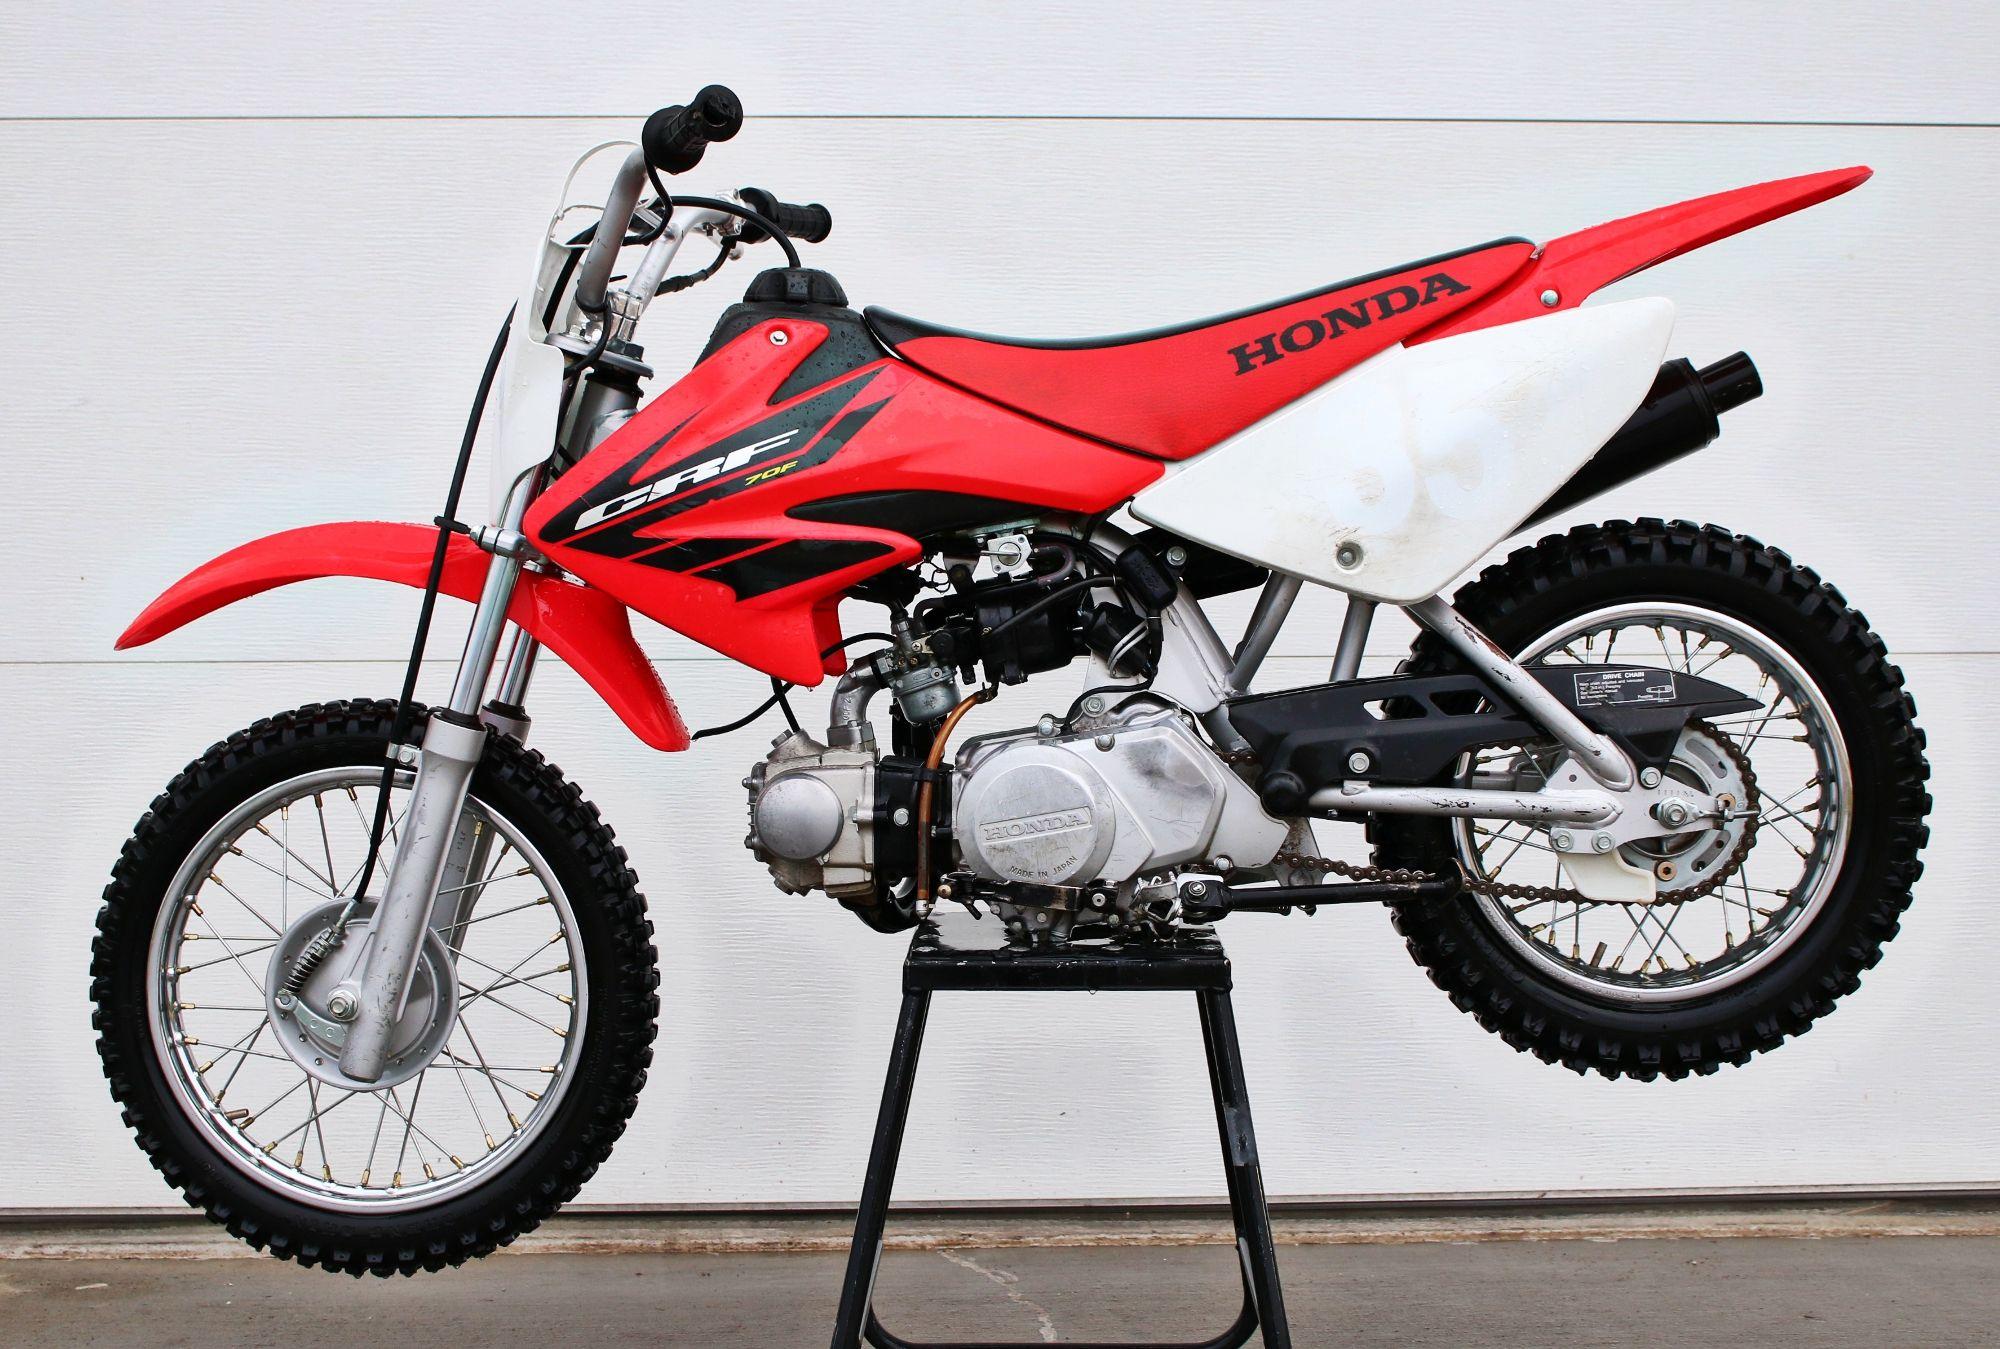 2004 Honda Crf70 Http Www Revivemotoparts Com Collections Xr Crf 50 70 Honda Bike Parts Bike